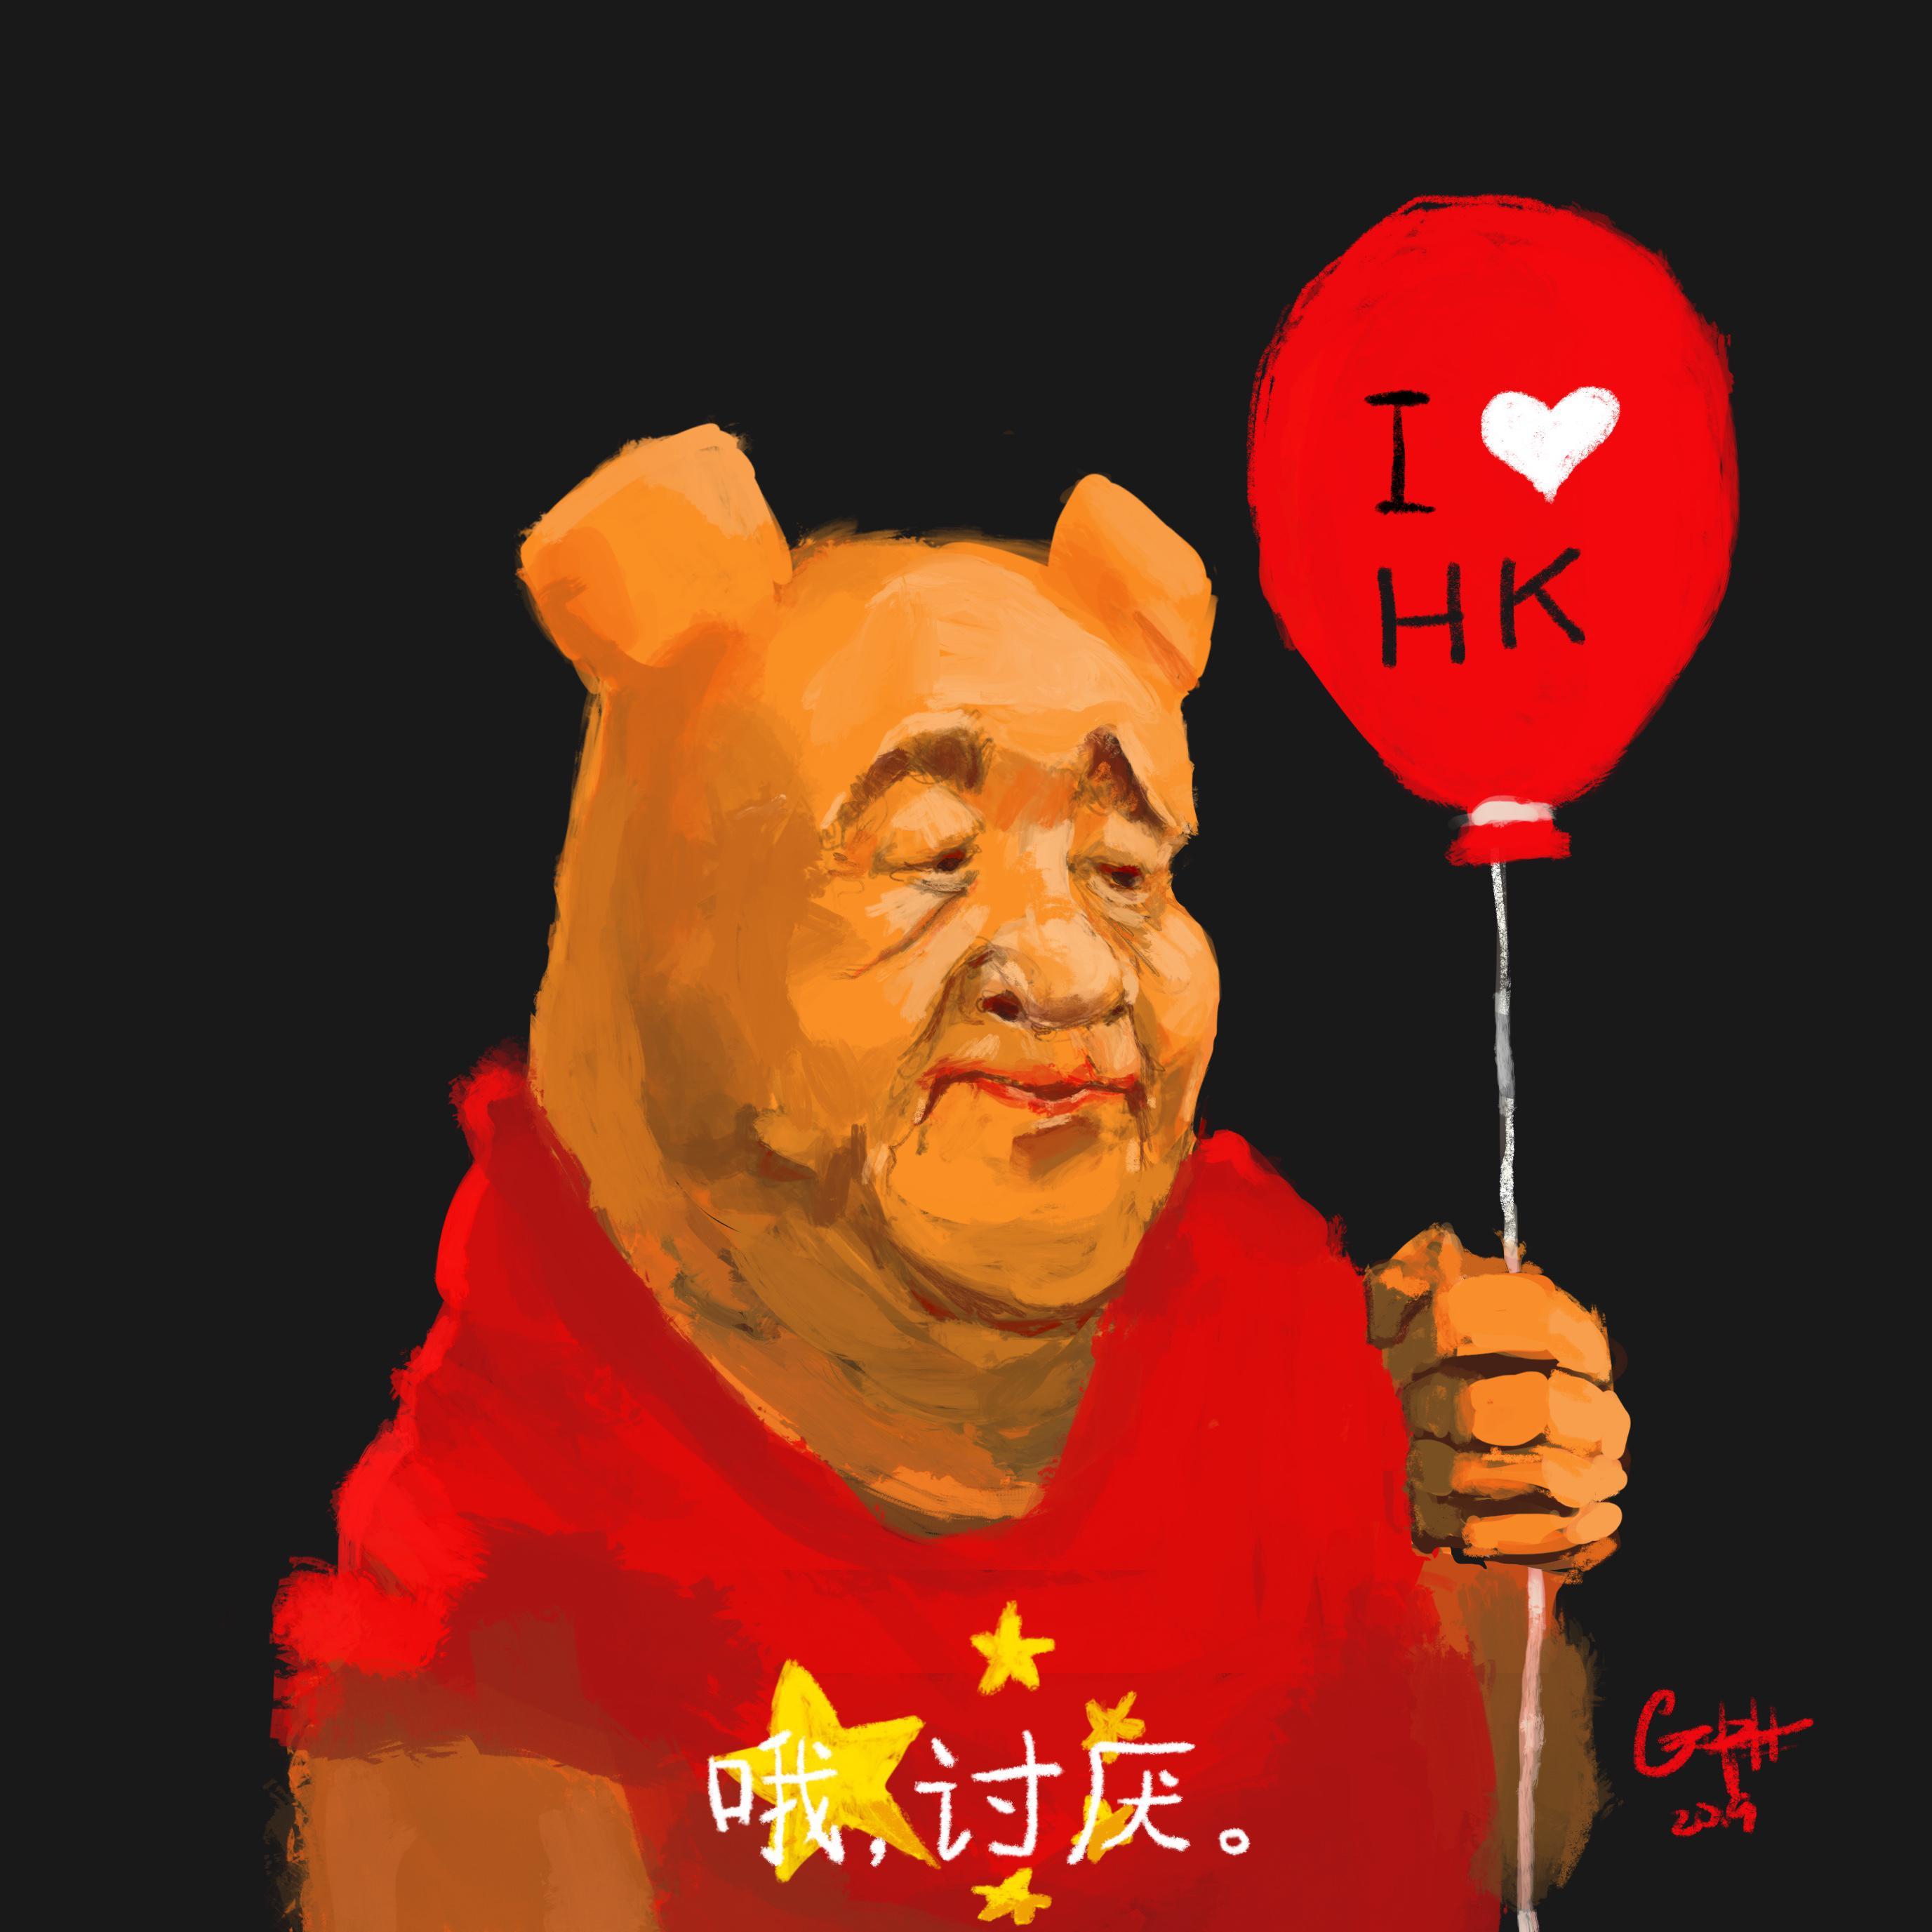 Stunning portrait of Xi Jinping.